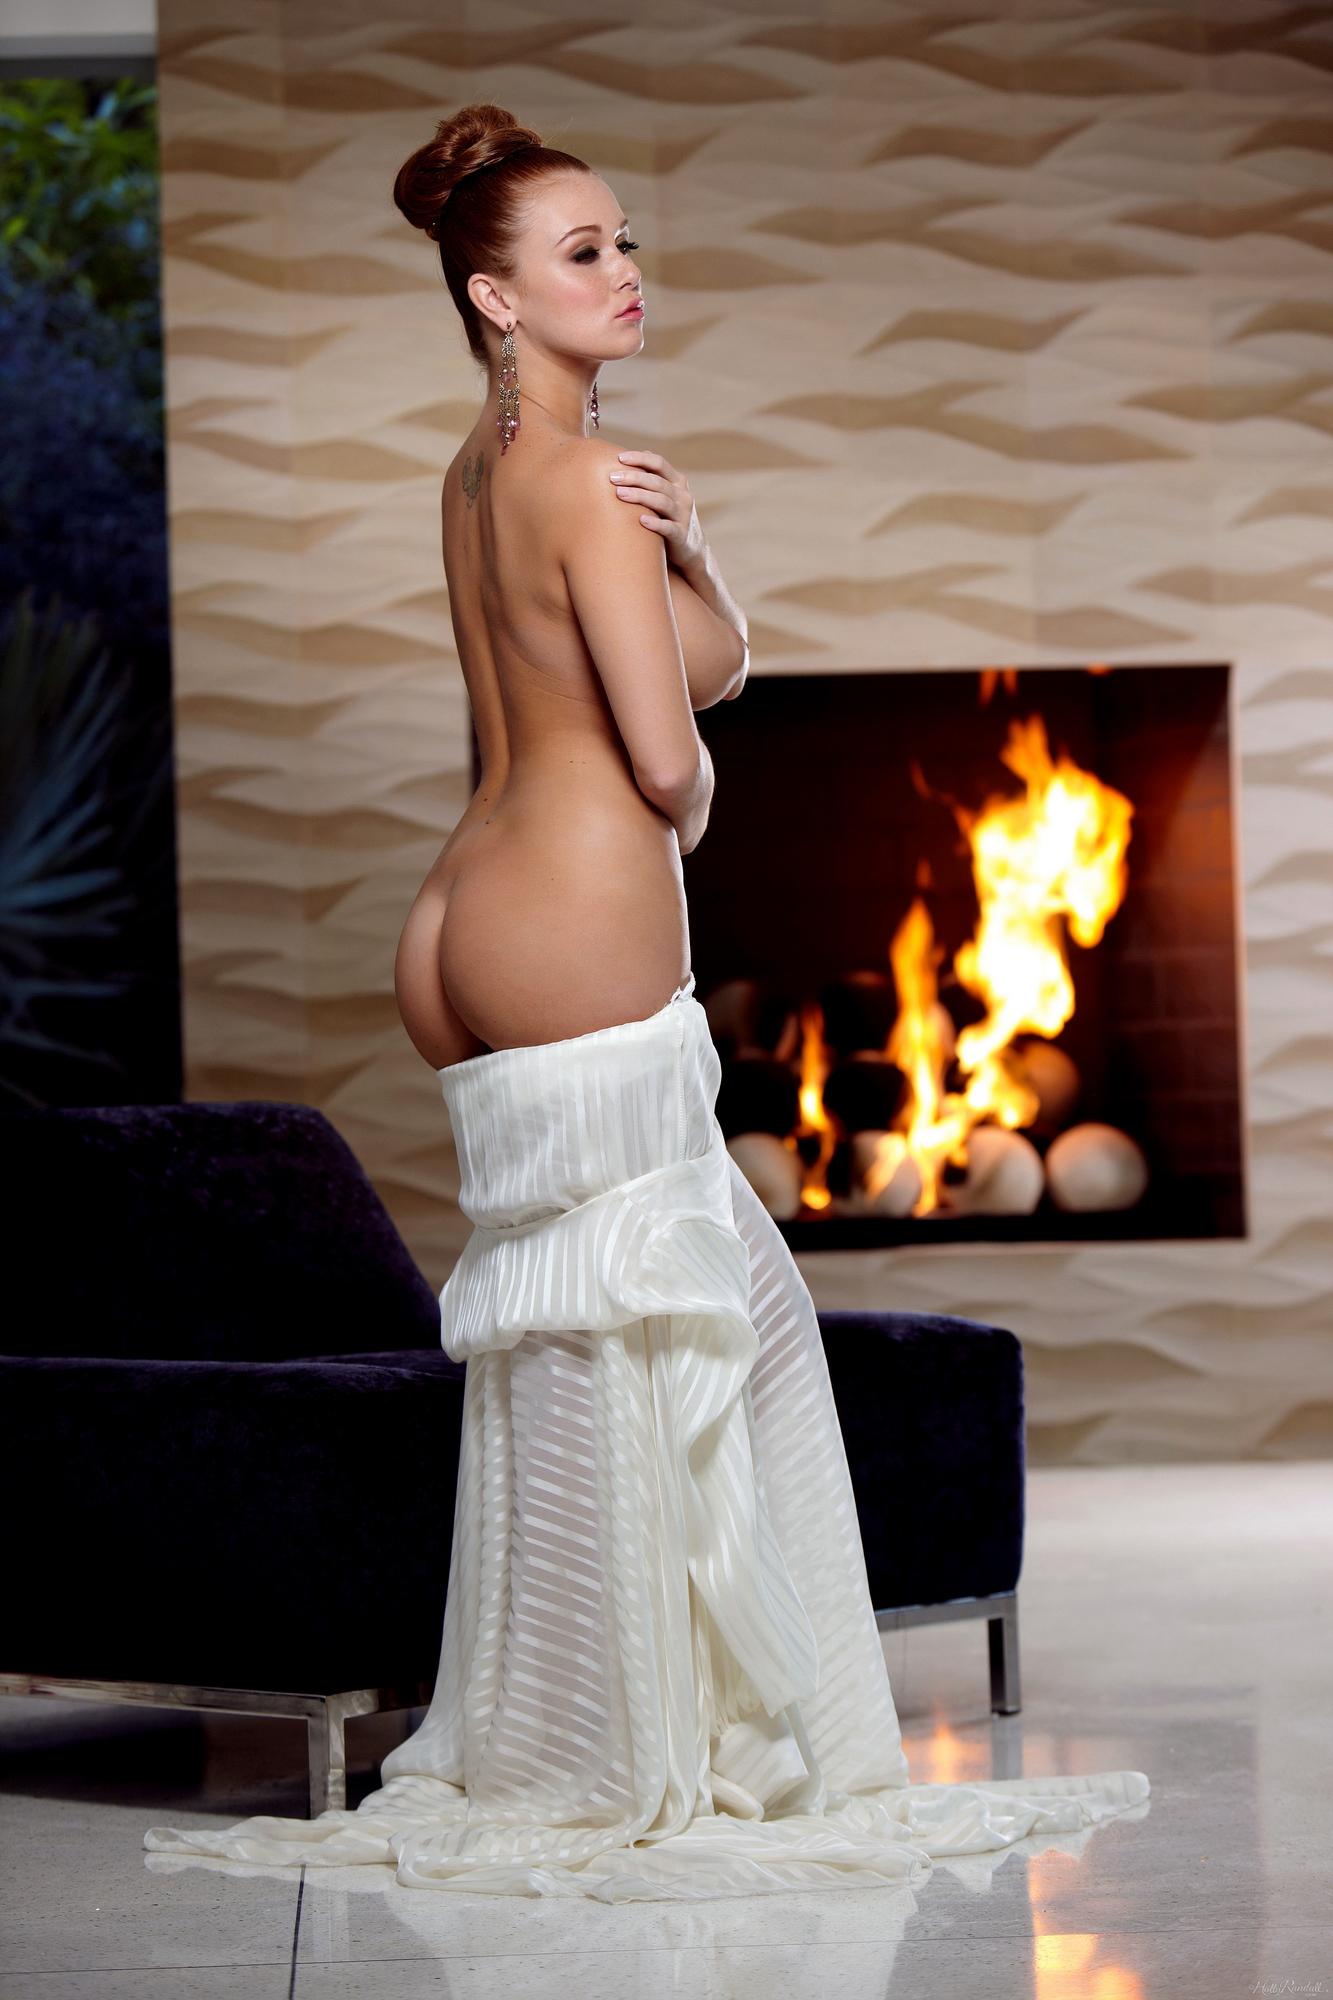 leanna-decker-nude-fireplace-redhead-hollyrandall-12